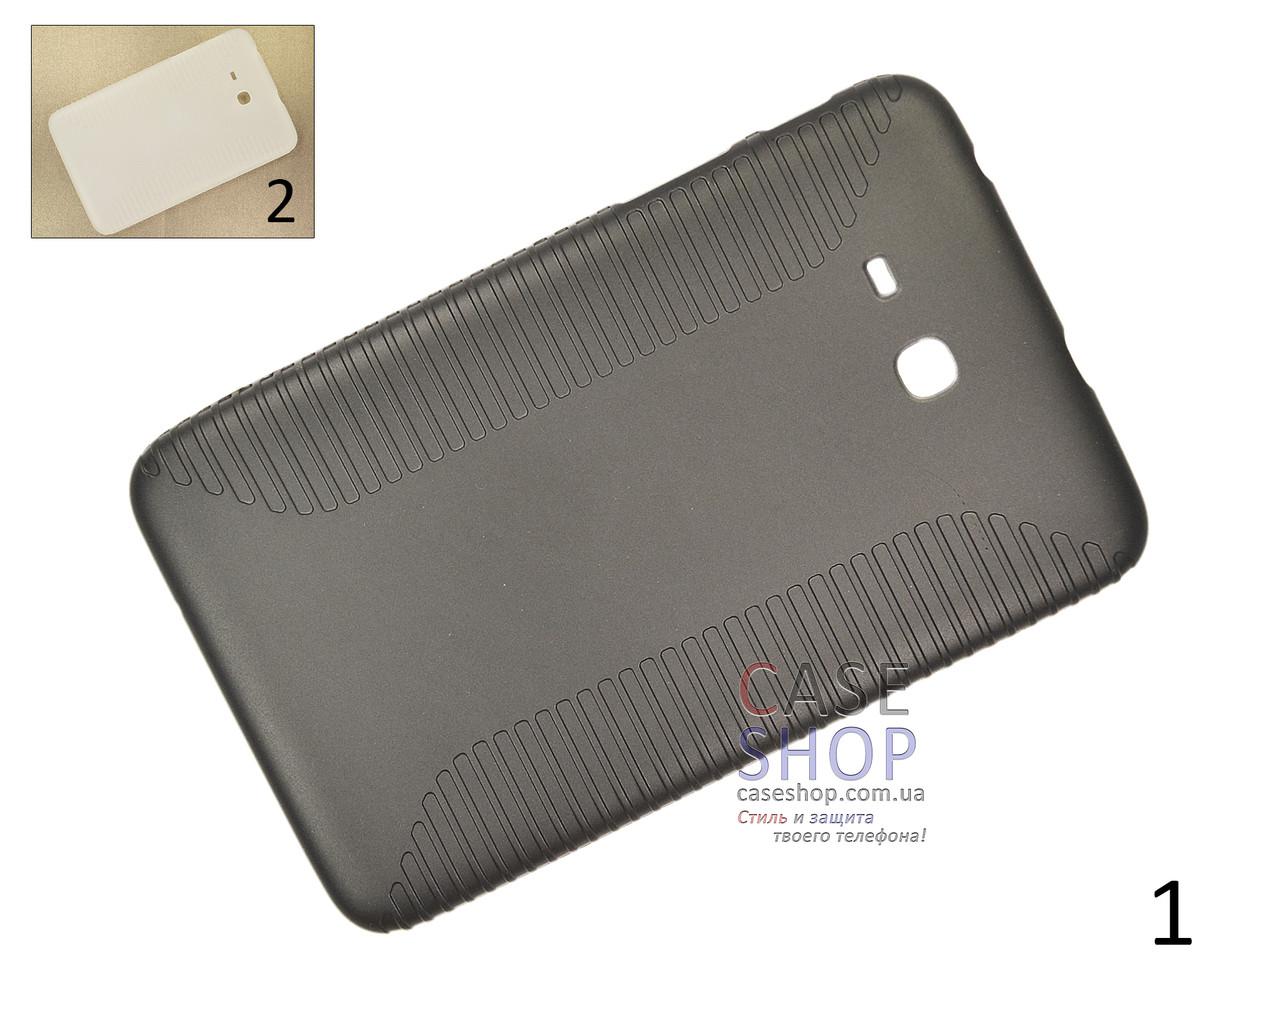 Силиконовый чехол для Samsung Galaxy Tab 3 Lite 7 T110/T111, фото 1